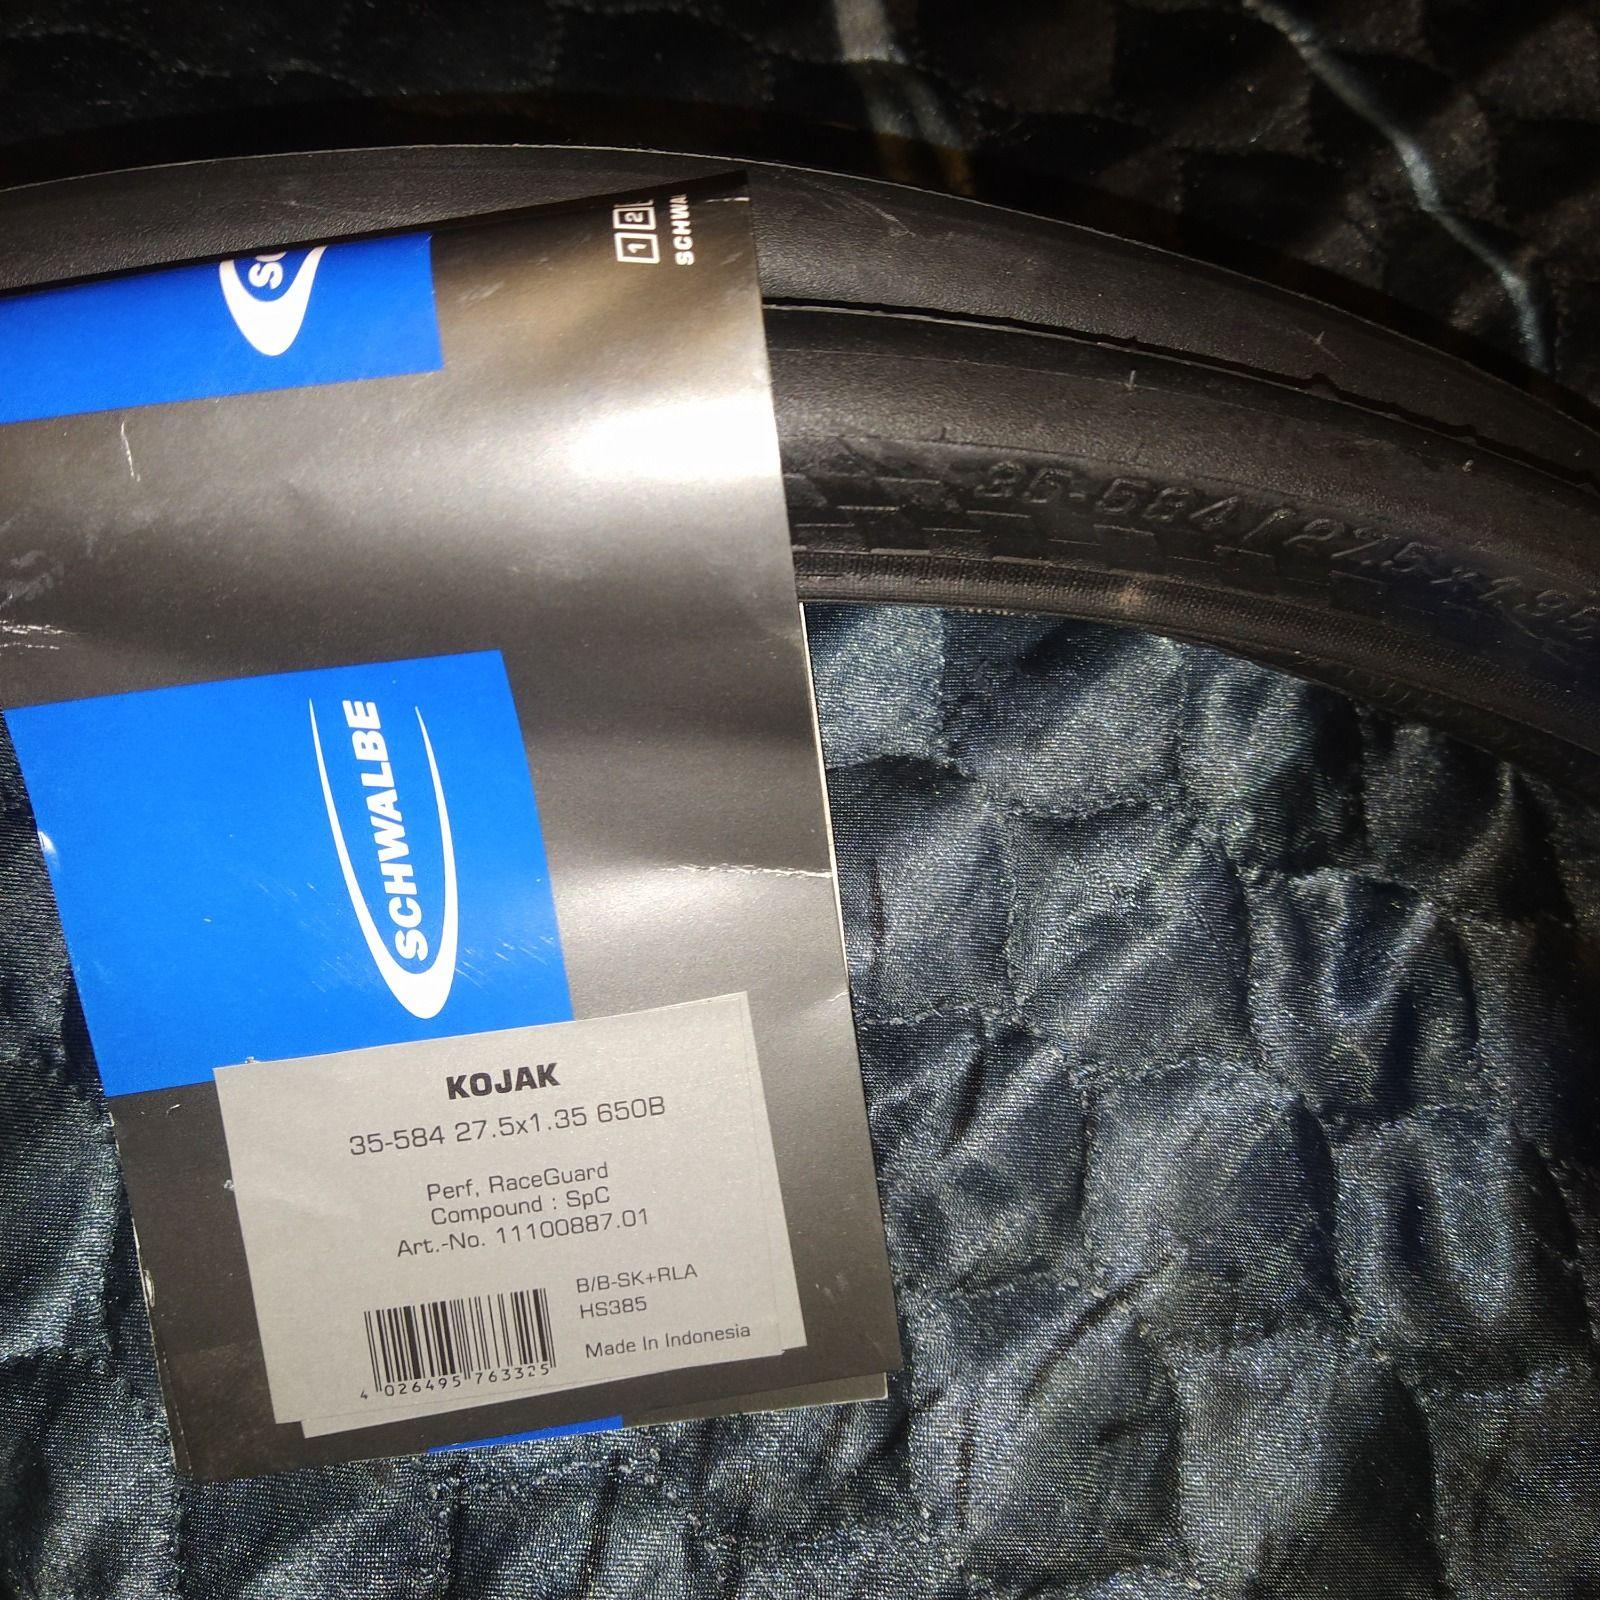 Покрышка Schwalbe Kojak Performance  27,5x1,35  650B антипрокол RaceGuard